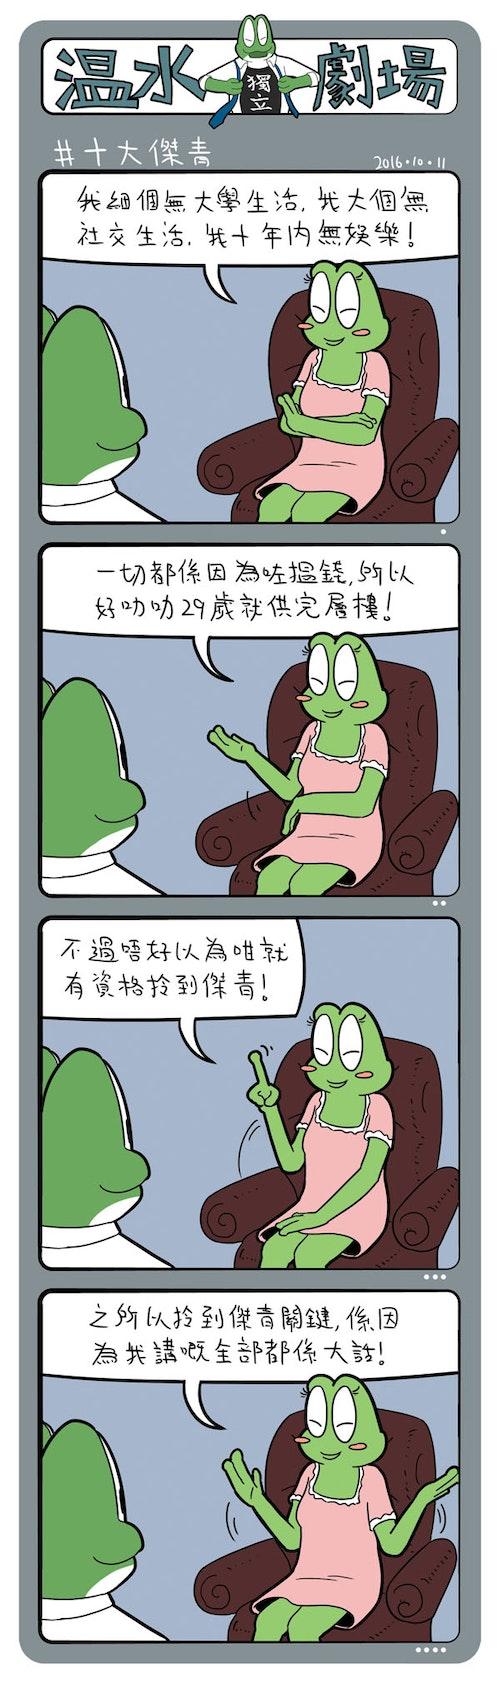 frog_news_lens_68_474